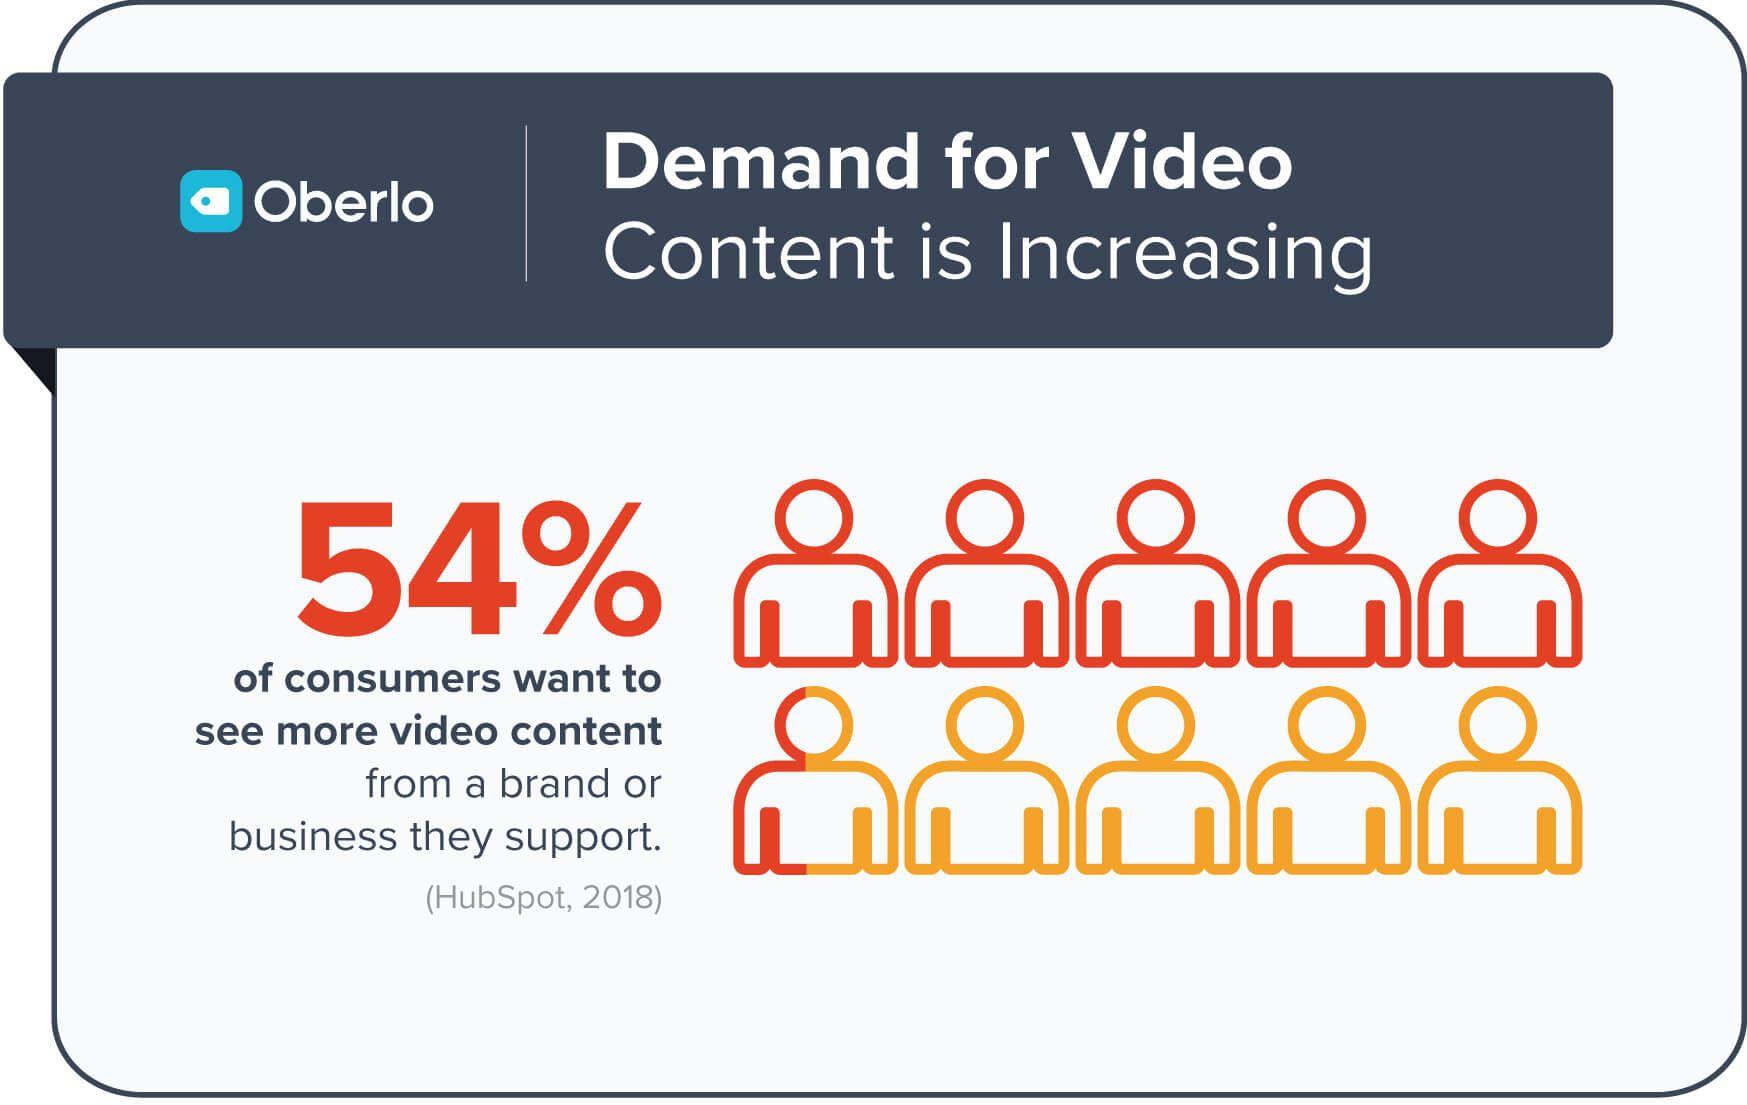 10 Video Marketing Statistics for 2020 [May 2020] | Digital marketing trends, Video marketing, Video marketing strategies